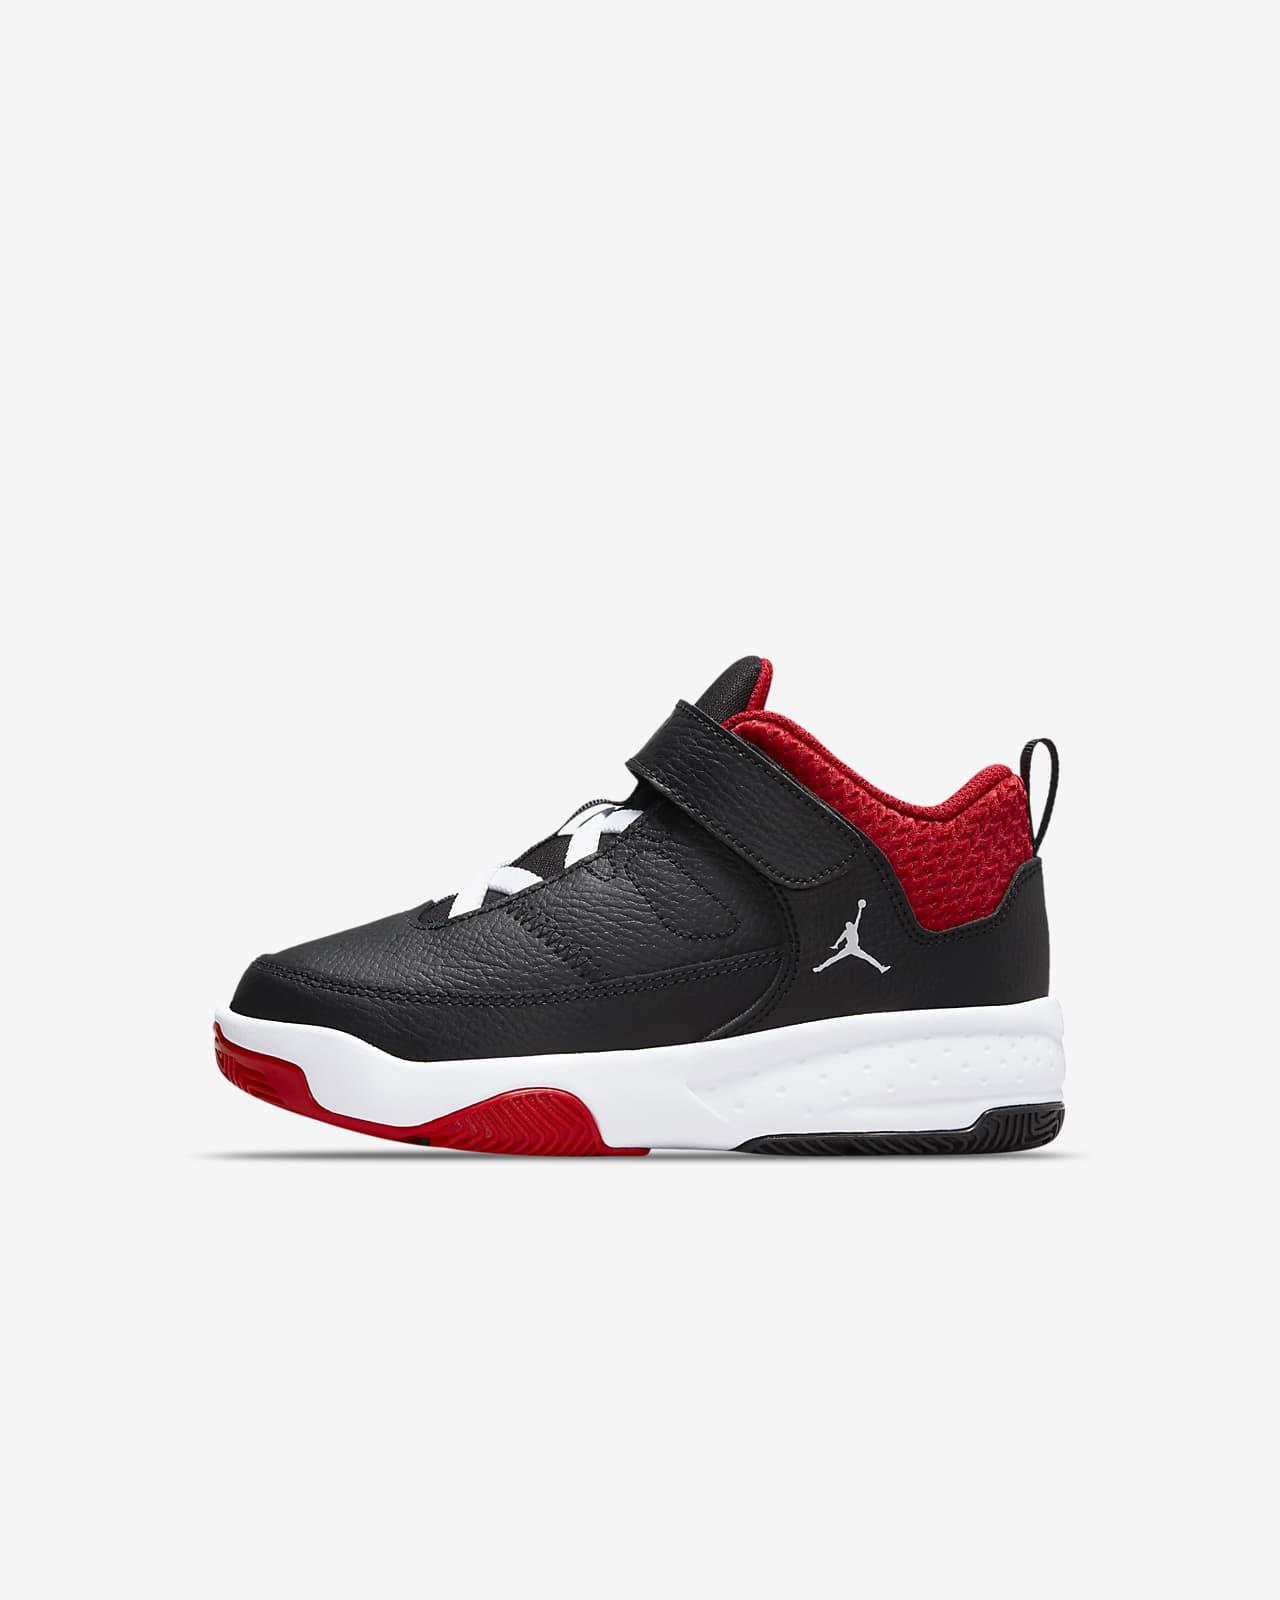 Jordan Max Aura 3 Little Kids' Shoes